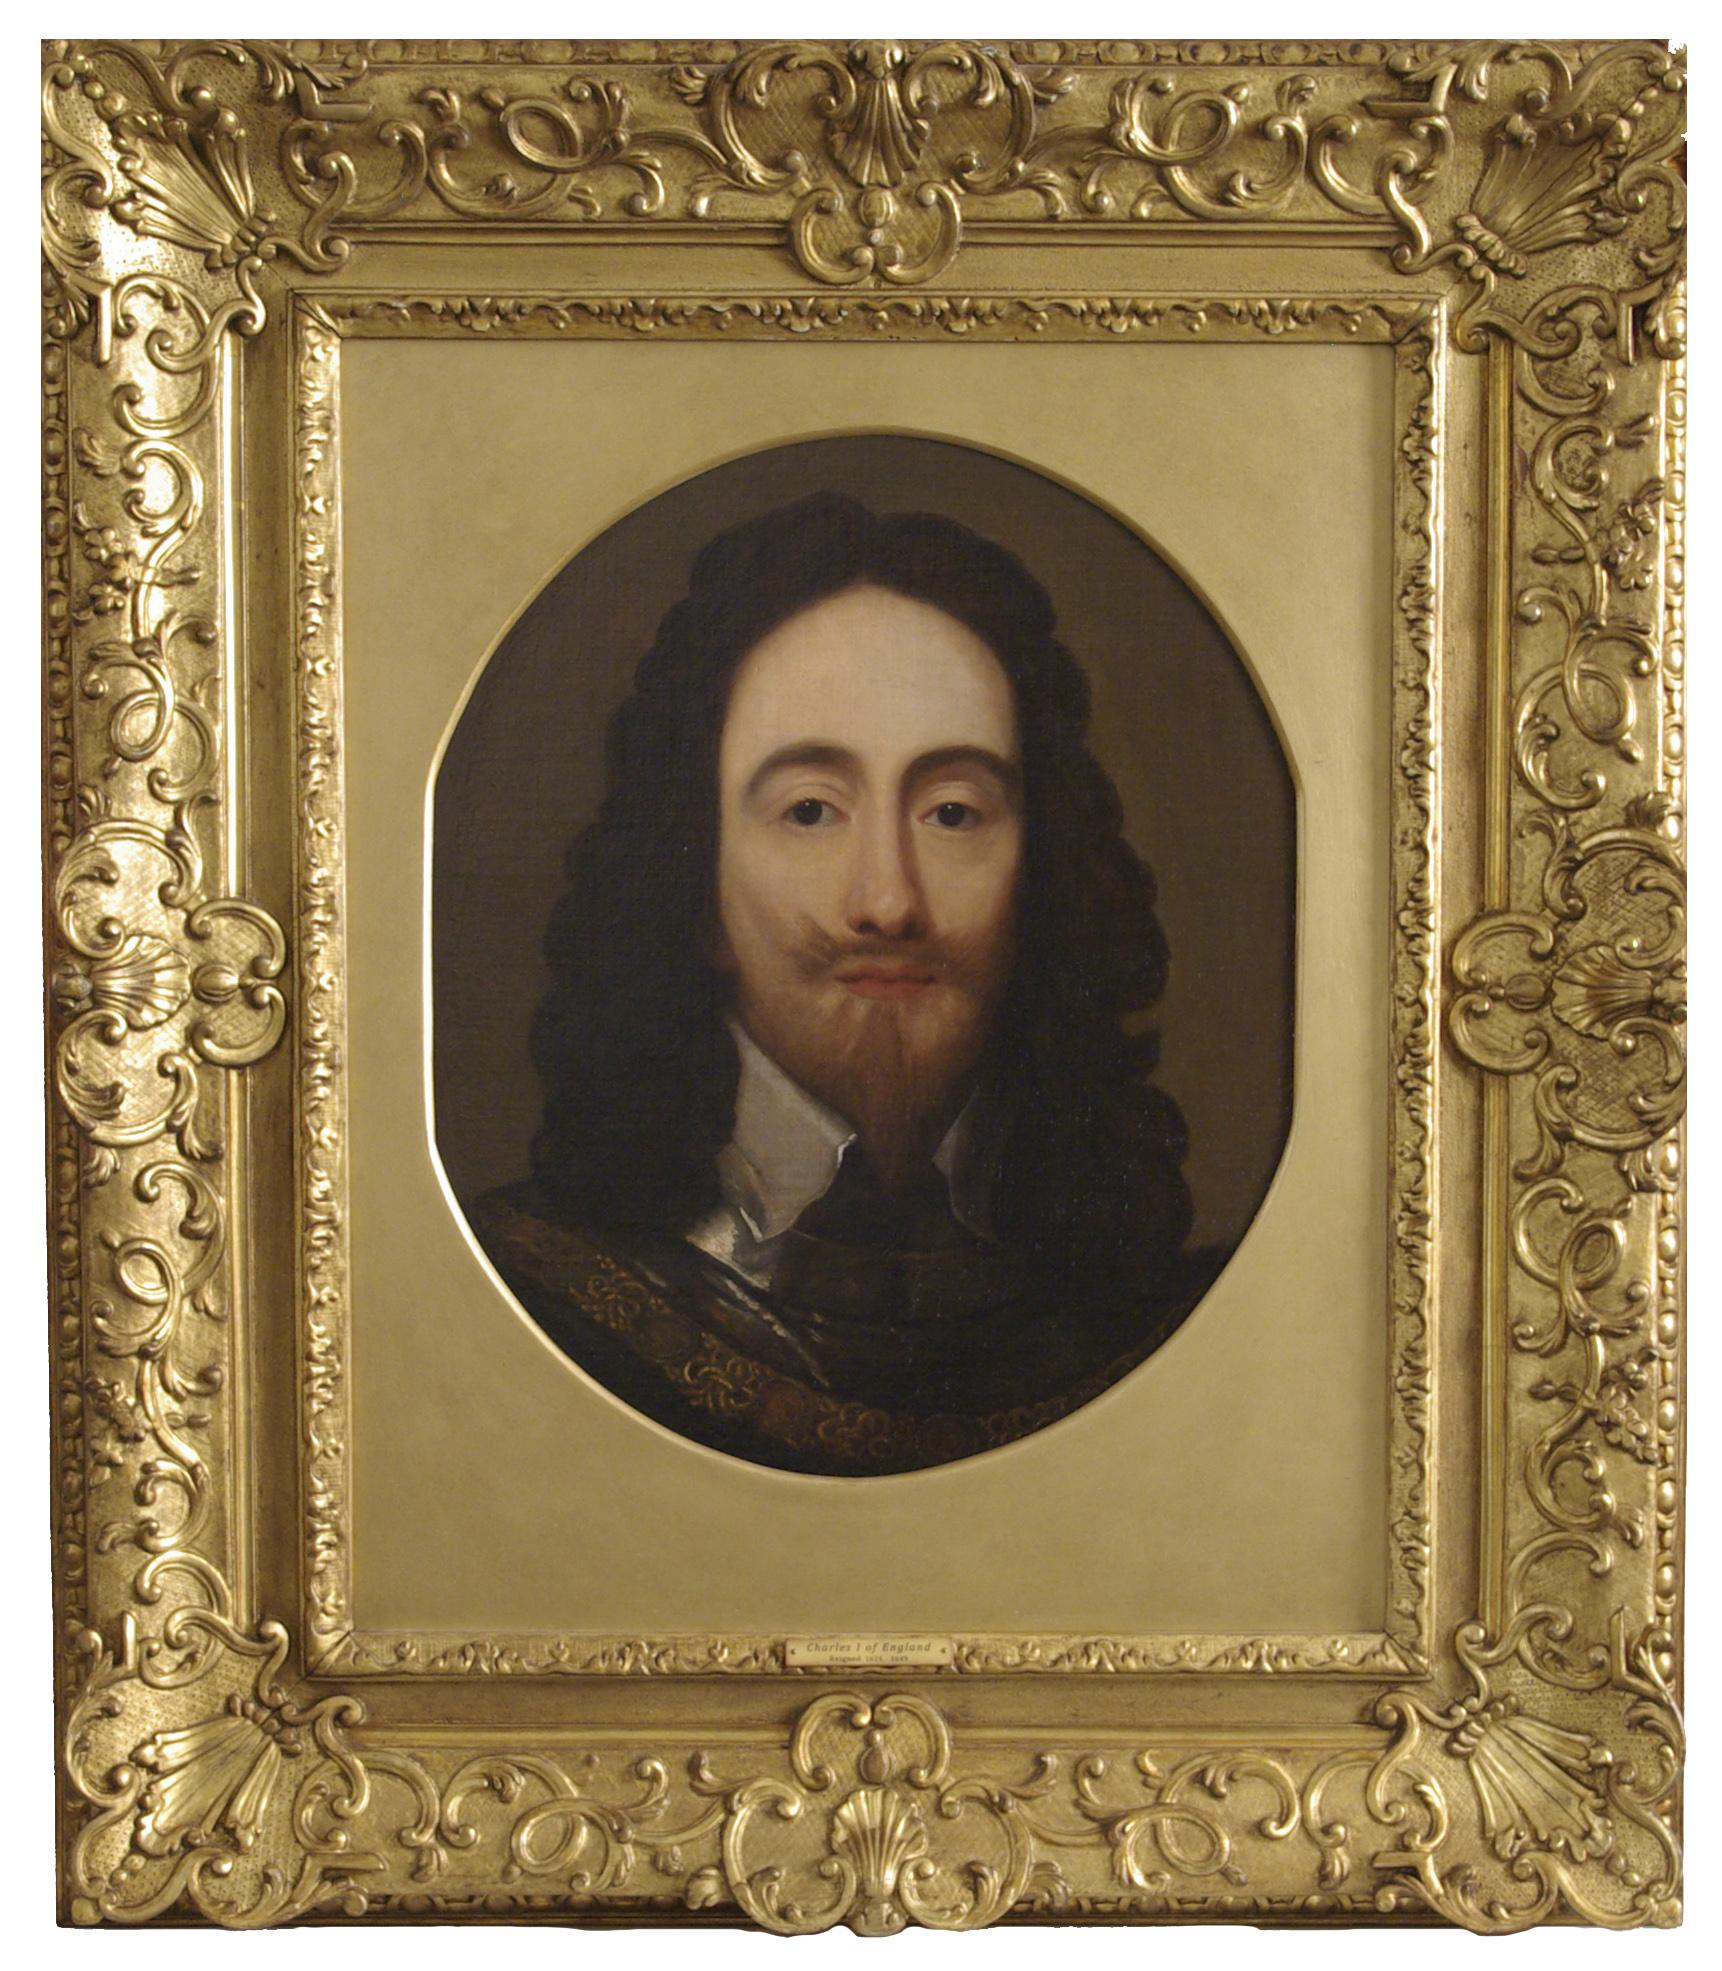 Charles 1 fr